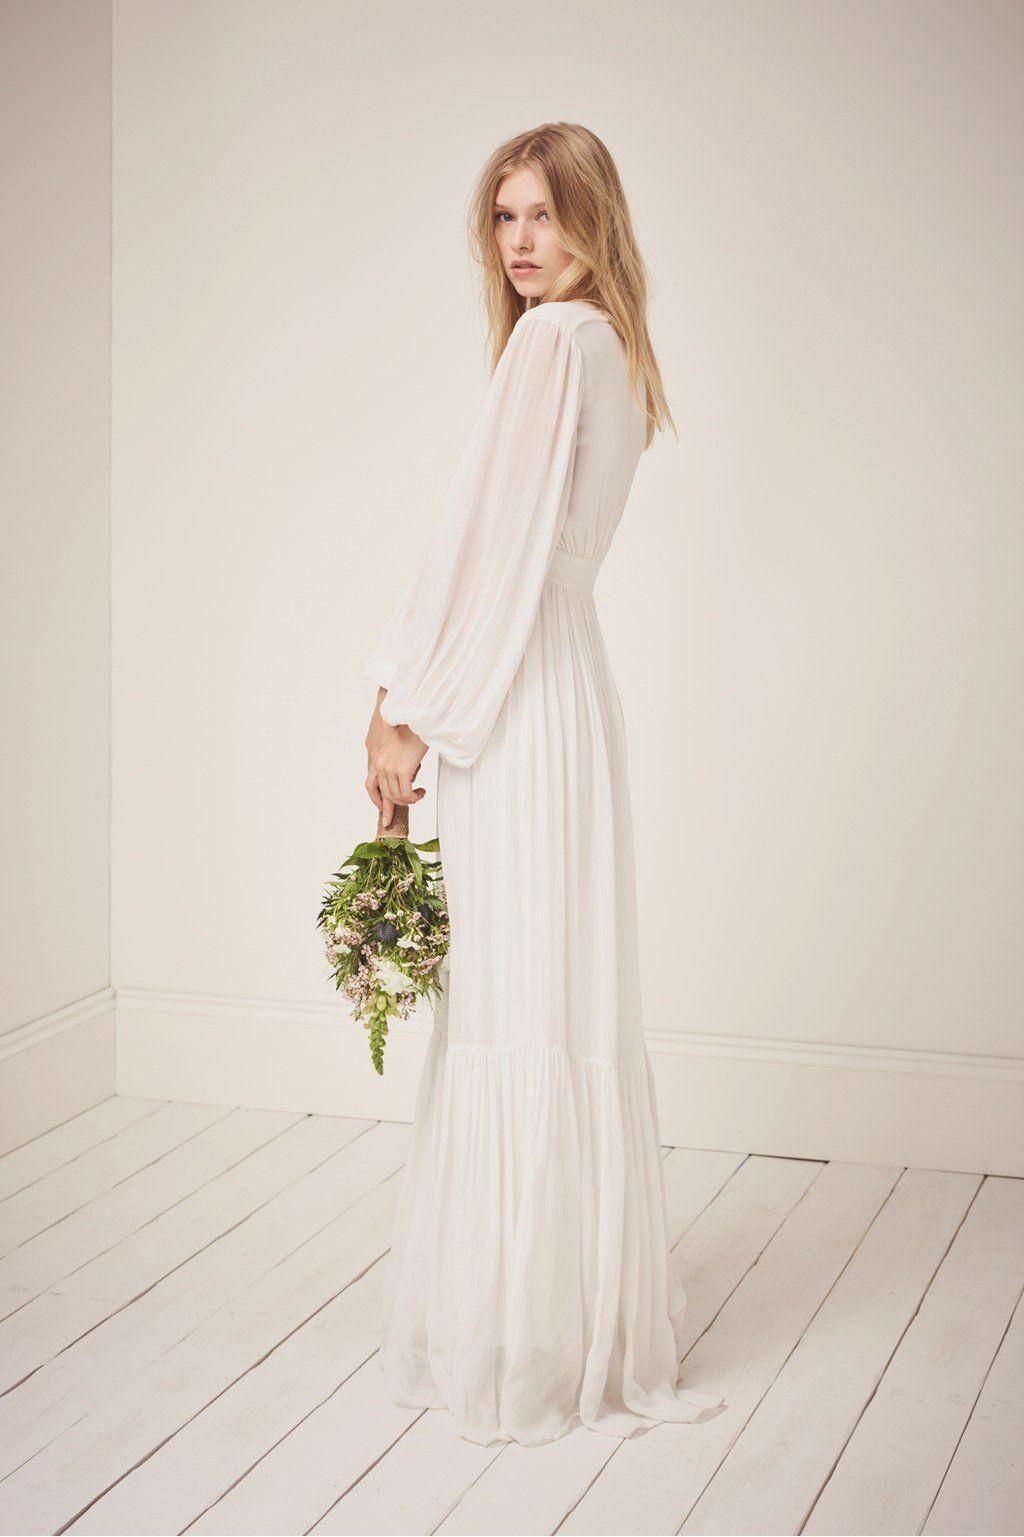 Atractivo french connection wedding dress componente ideas de